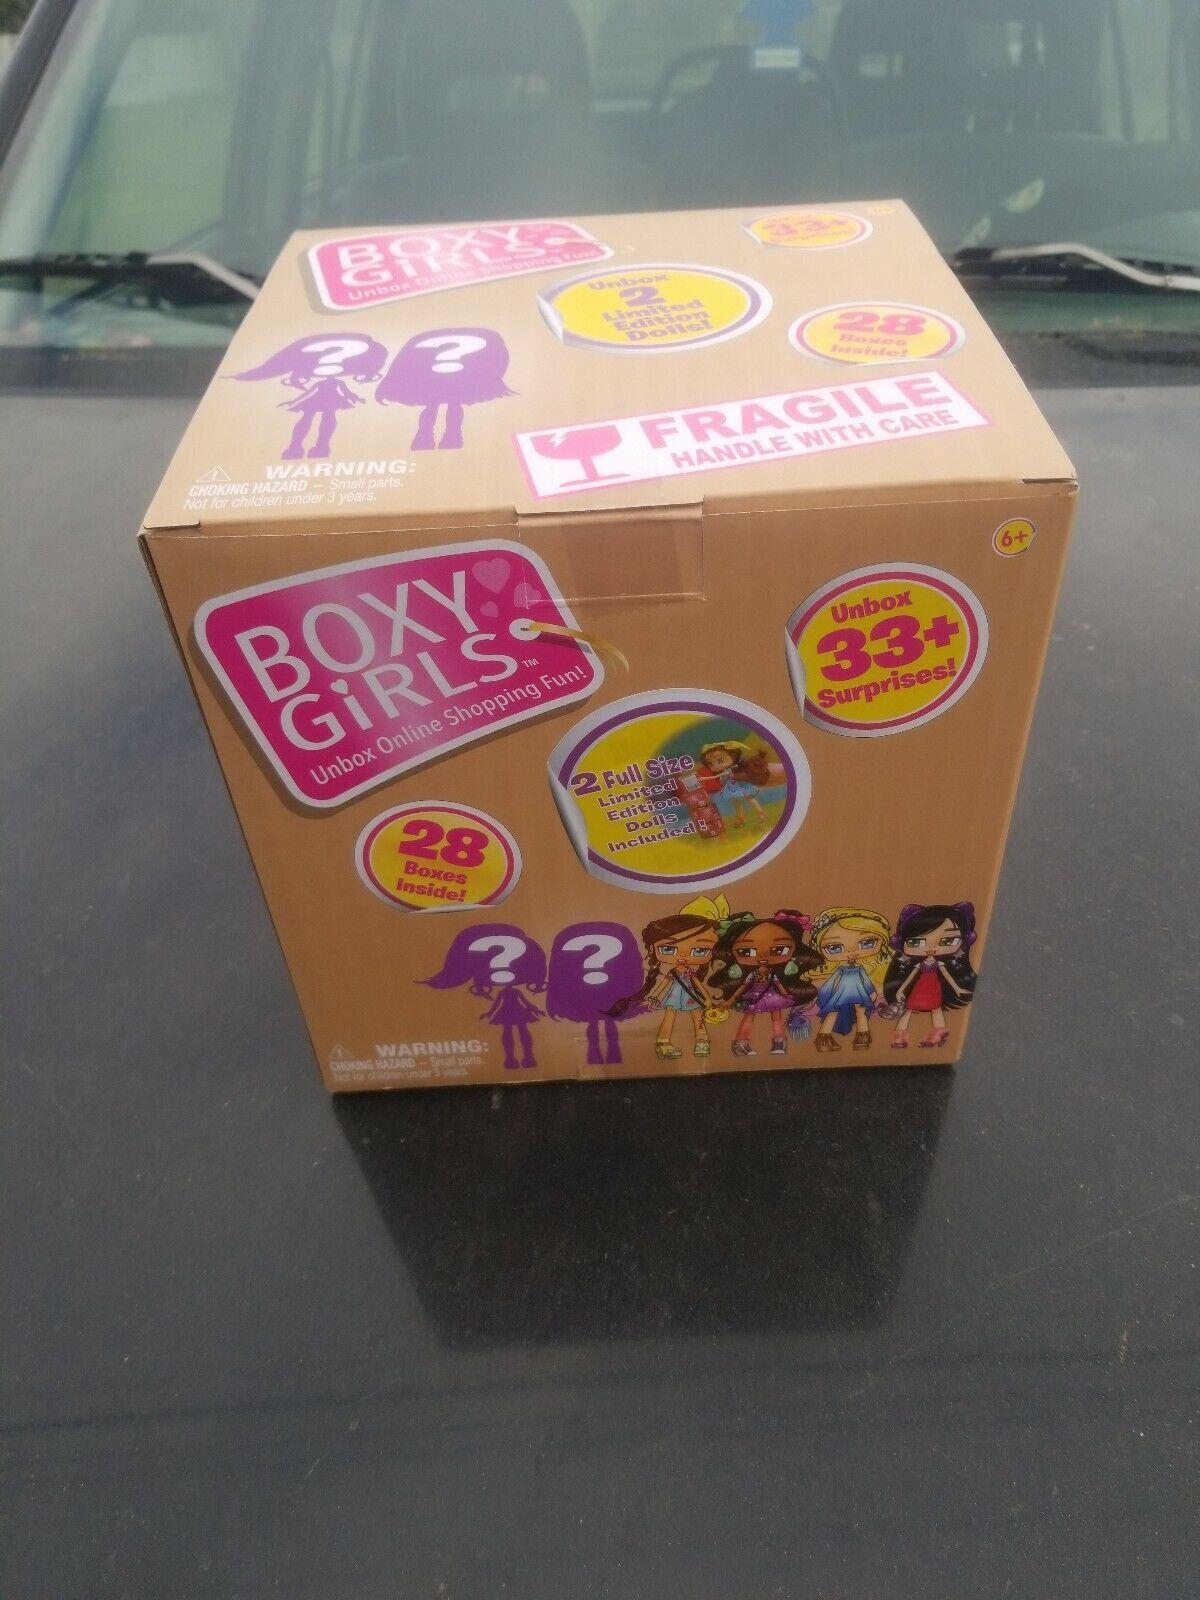 Boxy Girls Jumbo Crate Big Box 2 Limited Edition Dolls 28 Surprise Boxes New Surprise Box Ideas Of Surprise Box Birthday Gift Photo Diy Photo Album Gift